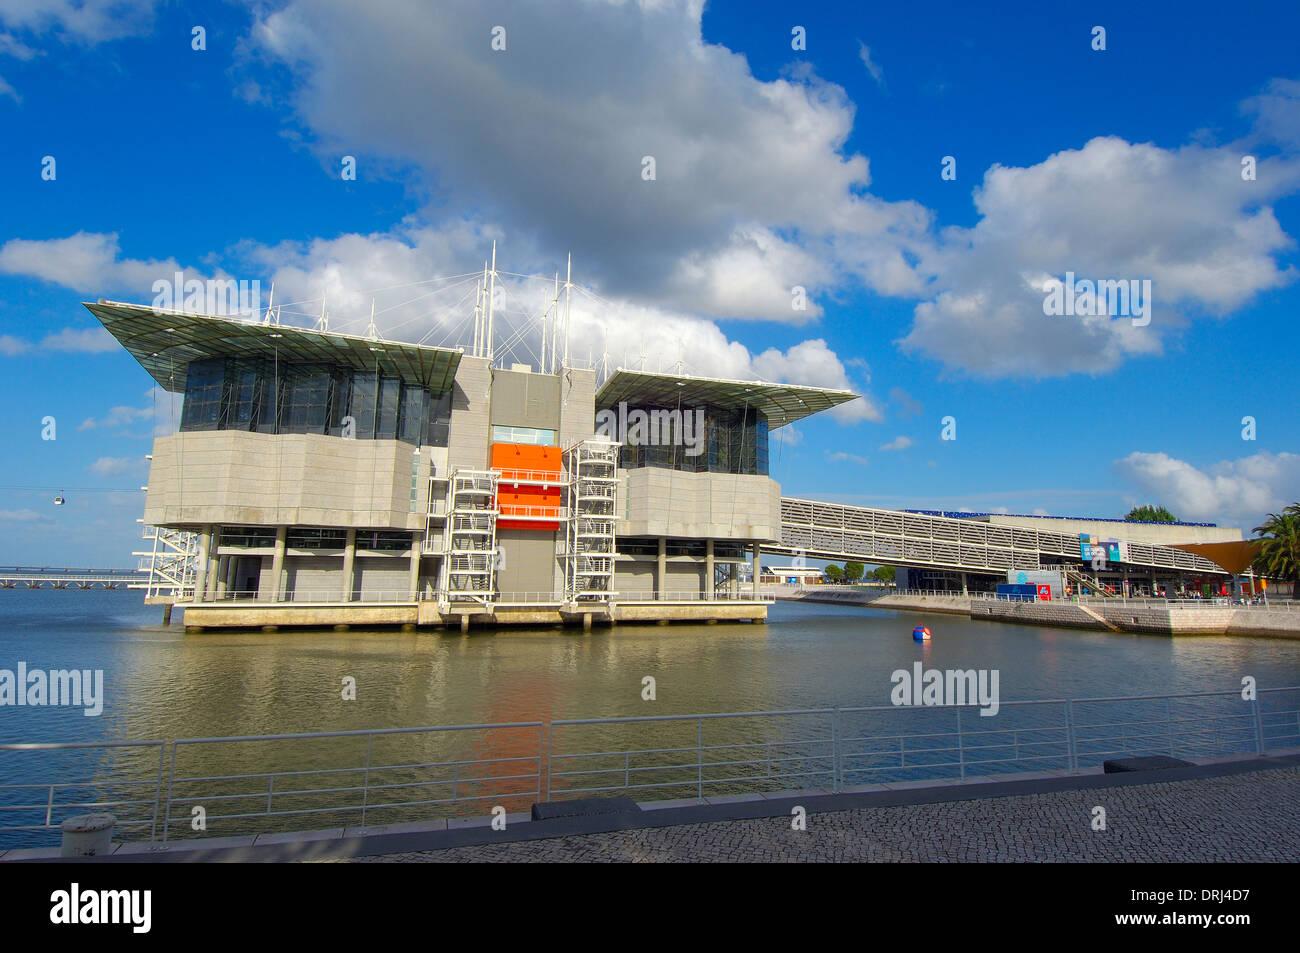 Lisbon. Aquarium in Parque das Nações, Oceanarium at Park of Nations, Lisbon Expo 98. Portugal Stock Photo